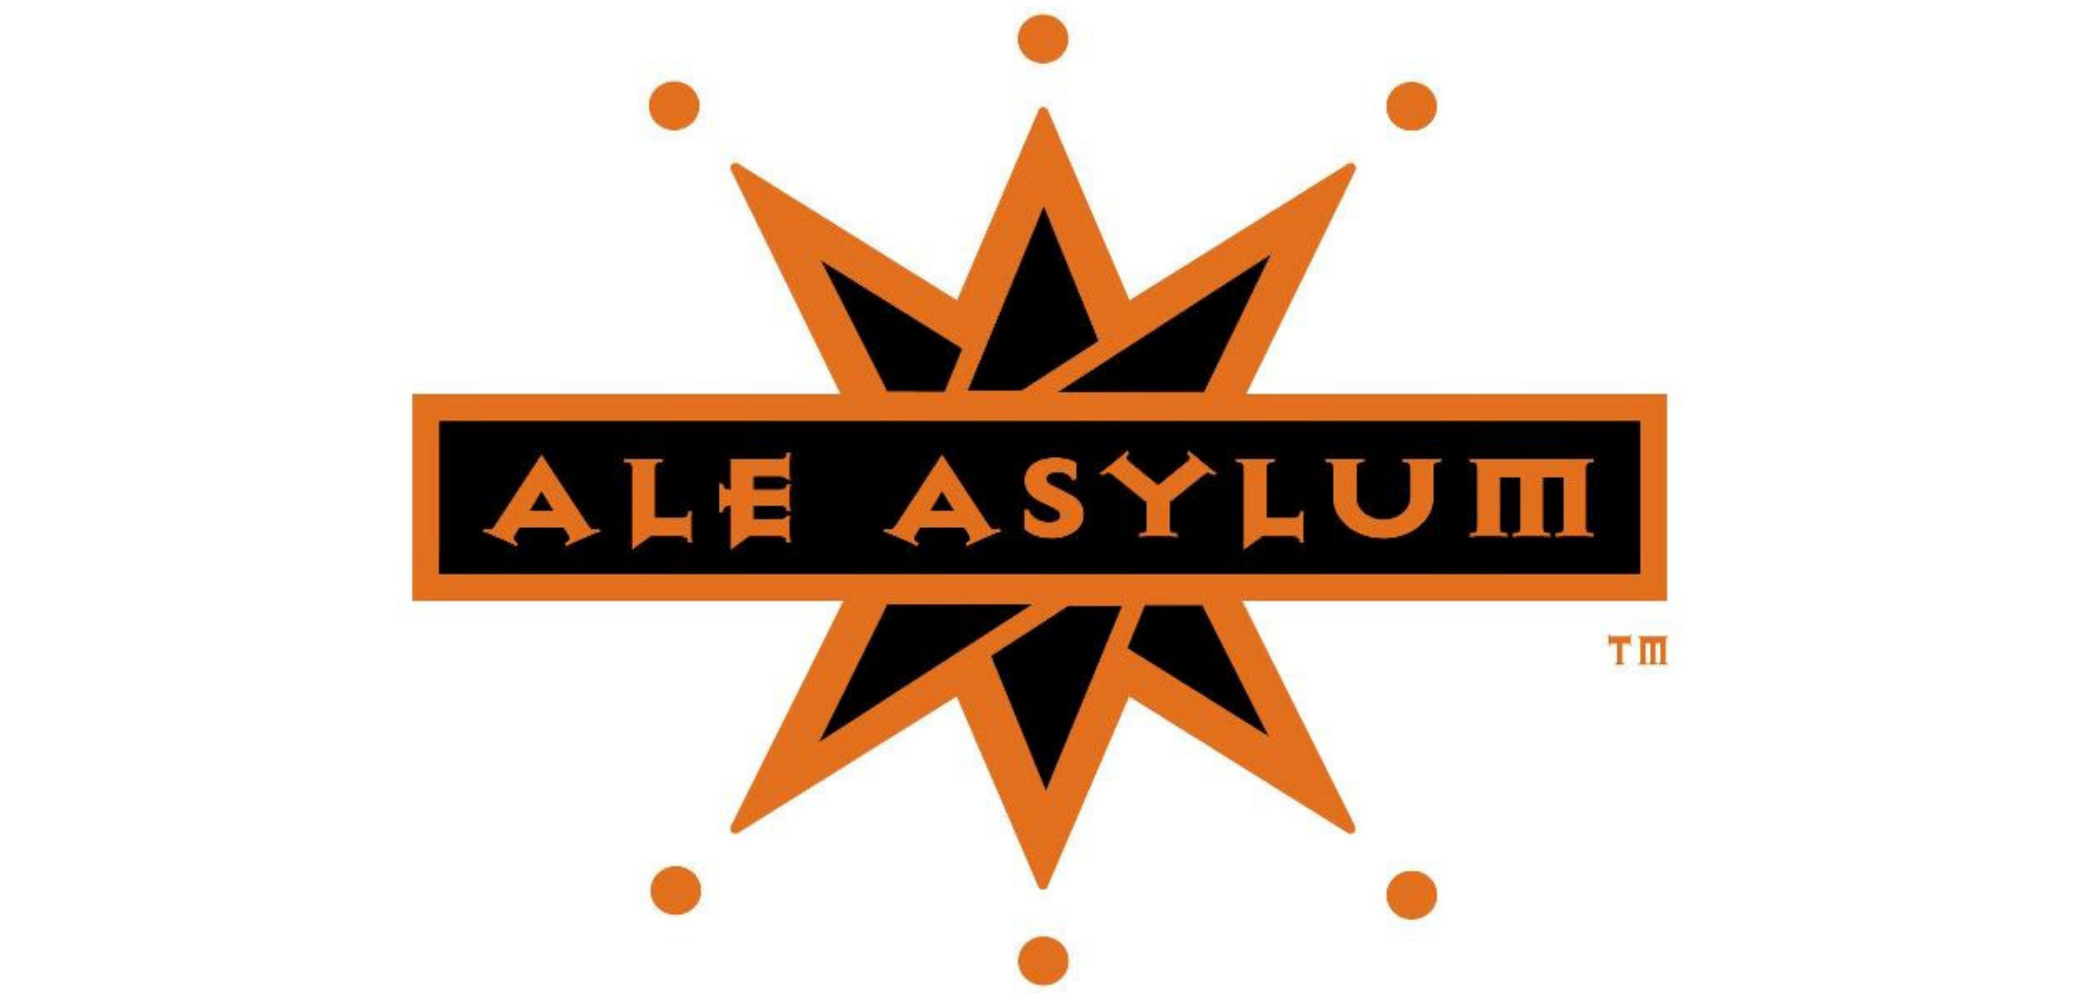 Ale Asylum AUCTION CANCELLED TO PURSUE OPERATOR SALE